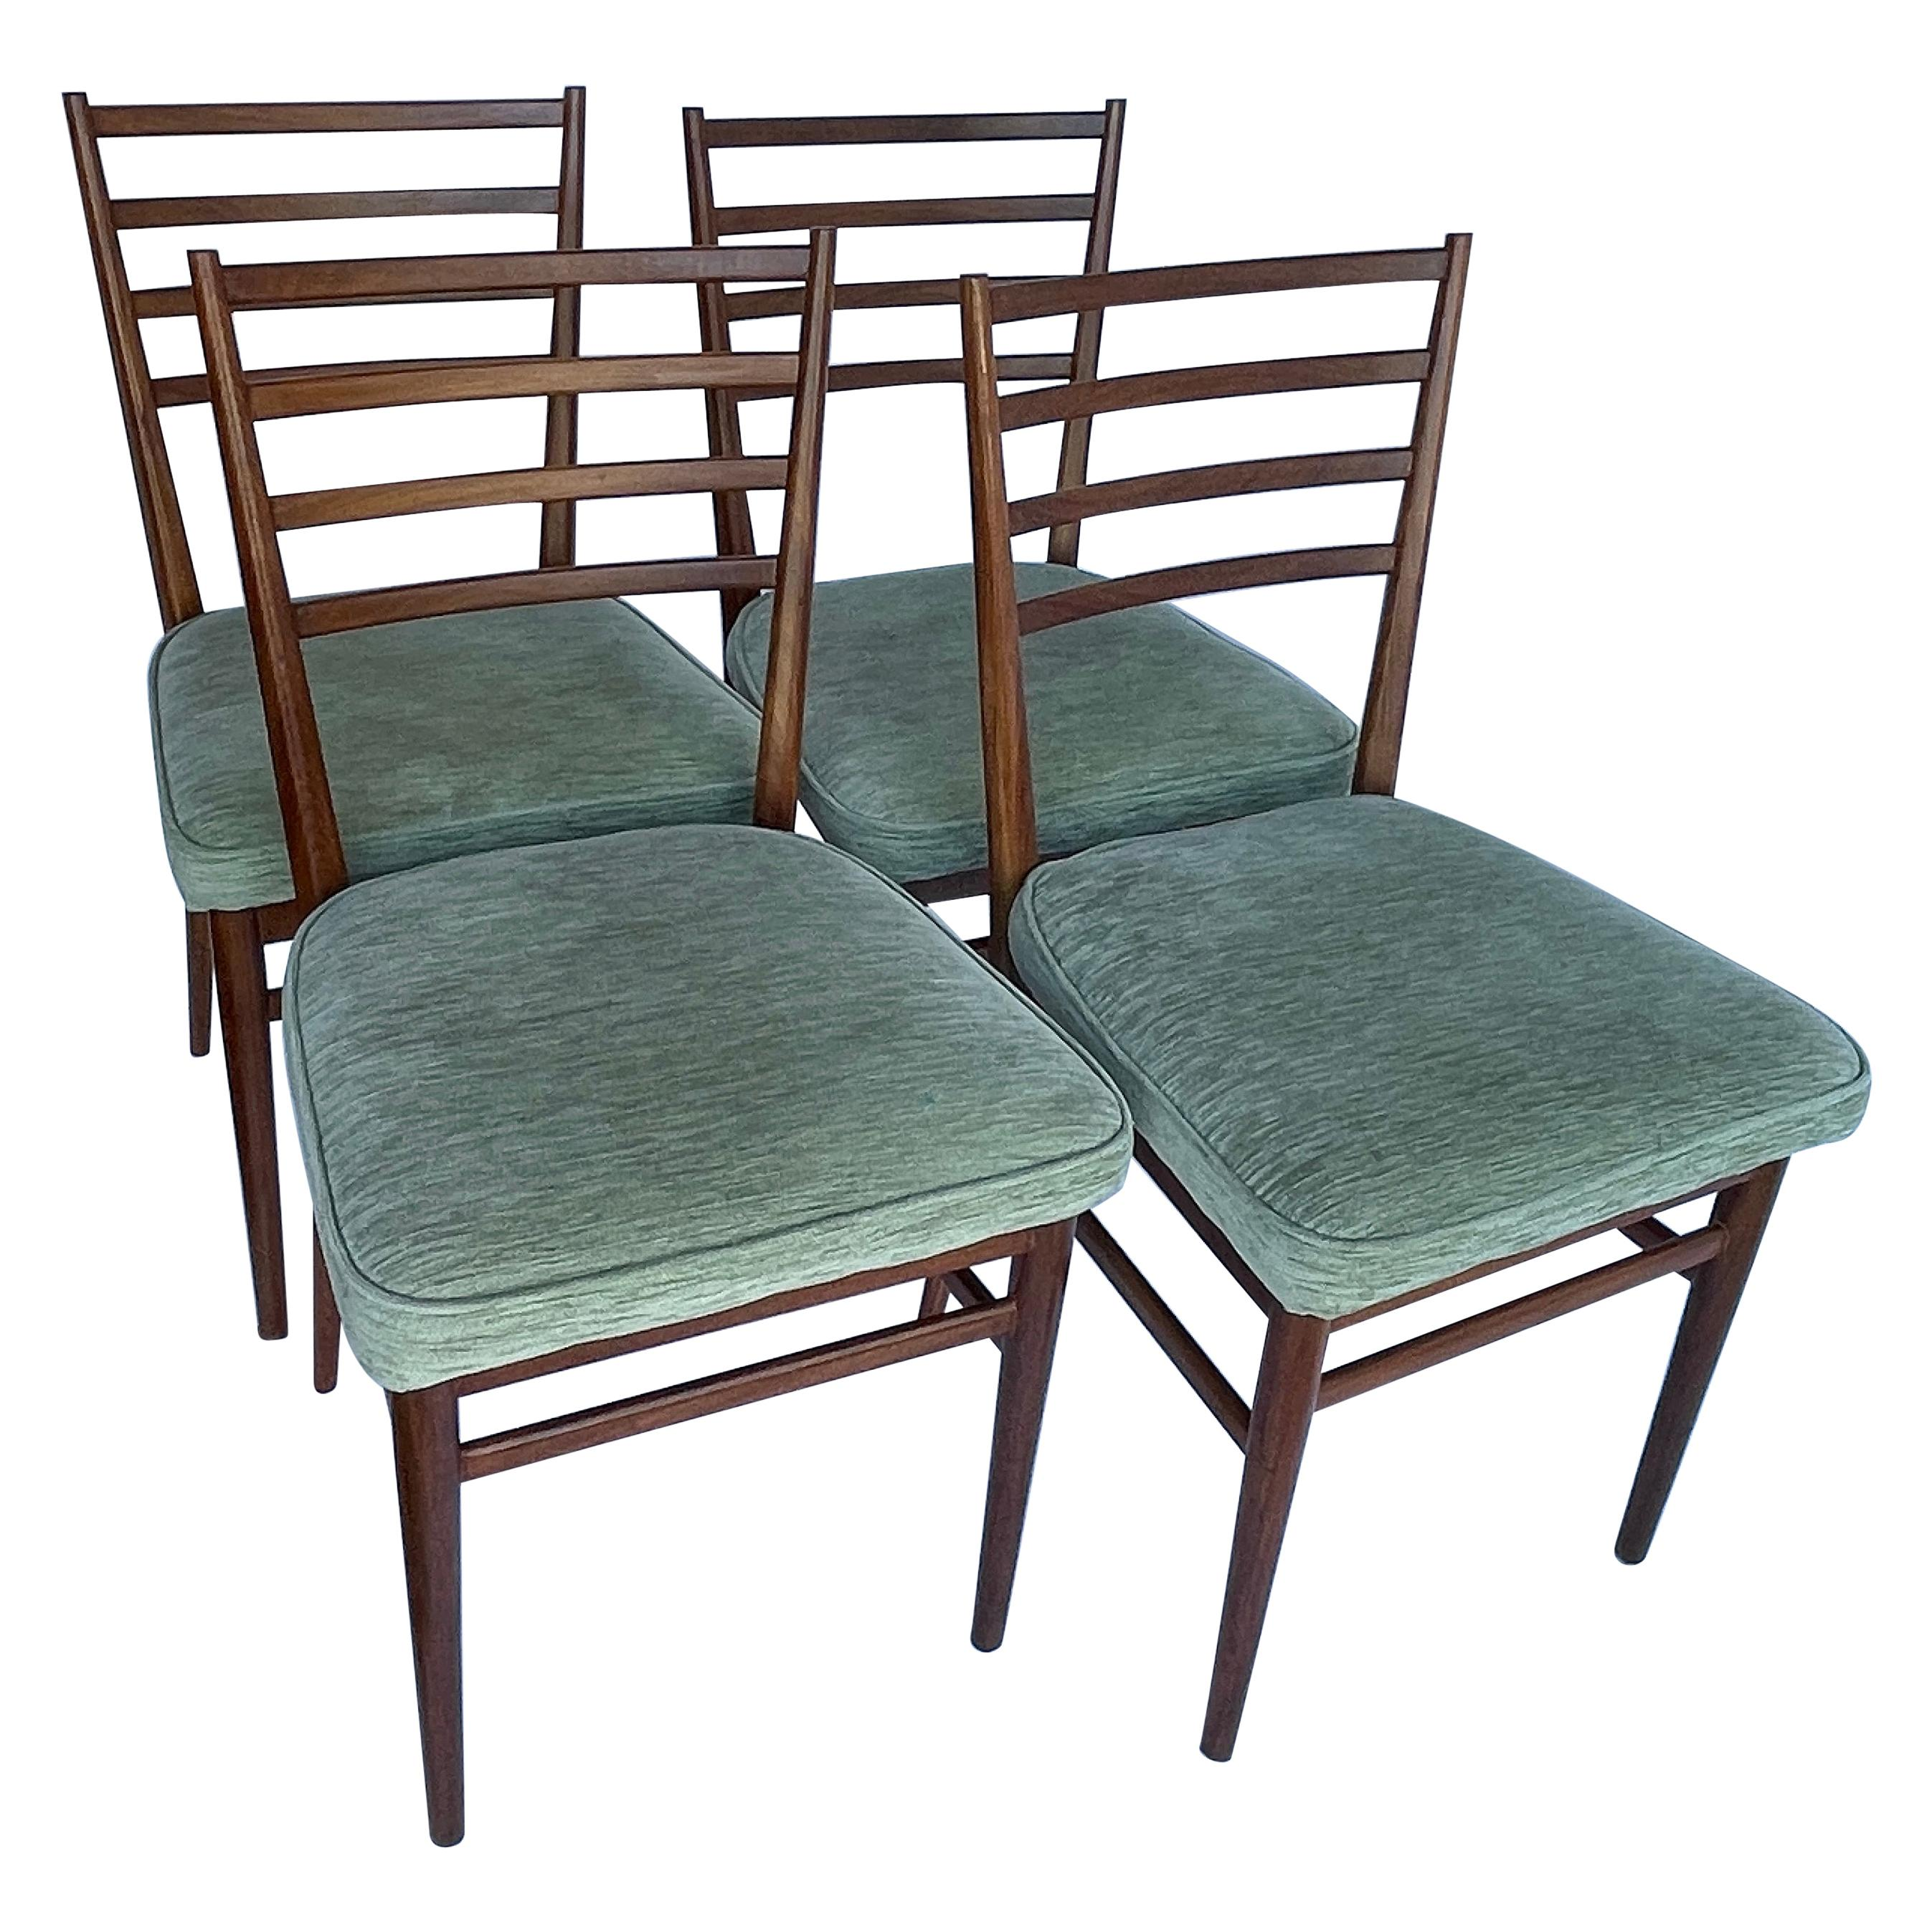 Set of Four Mid-Century Modern Meredew Teak Dining Chairs